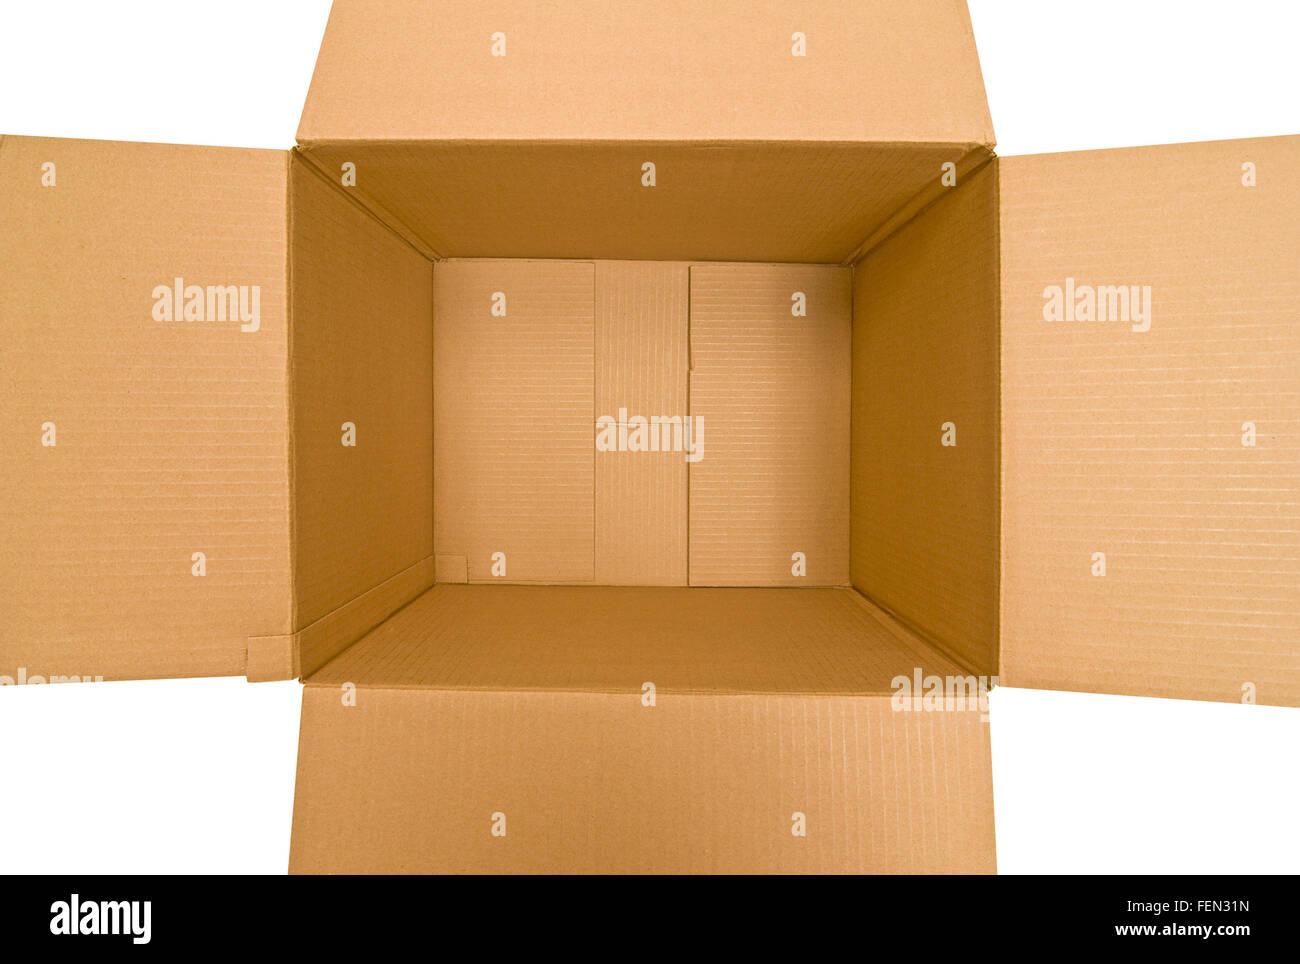 Empty Cardboard Box Three - Stock Image